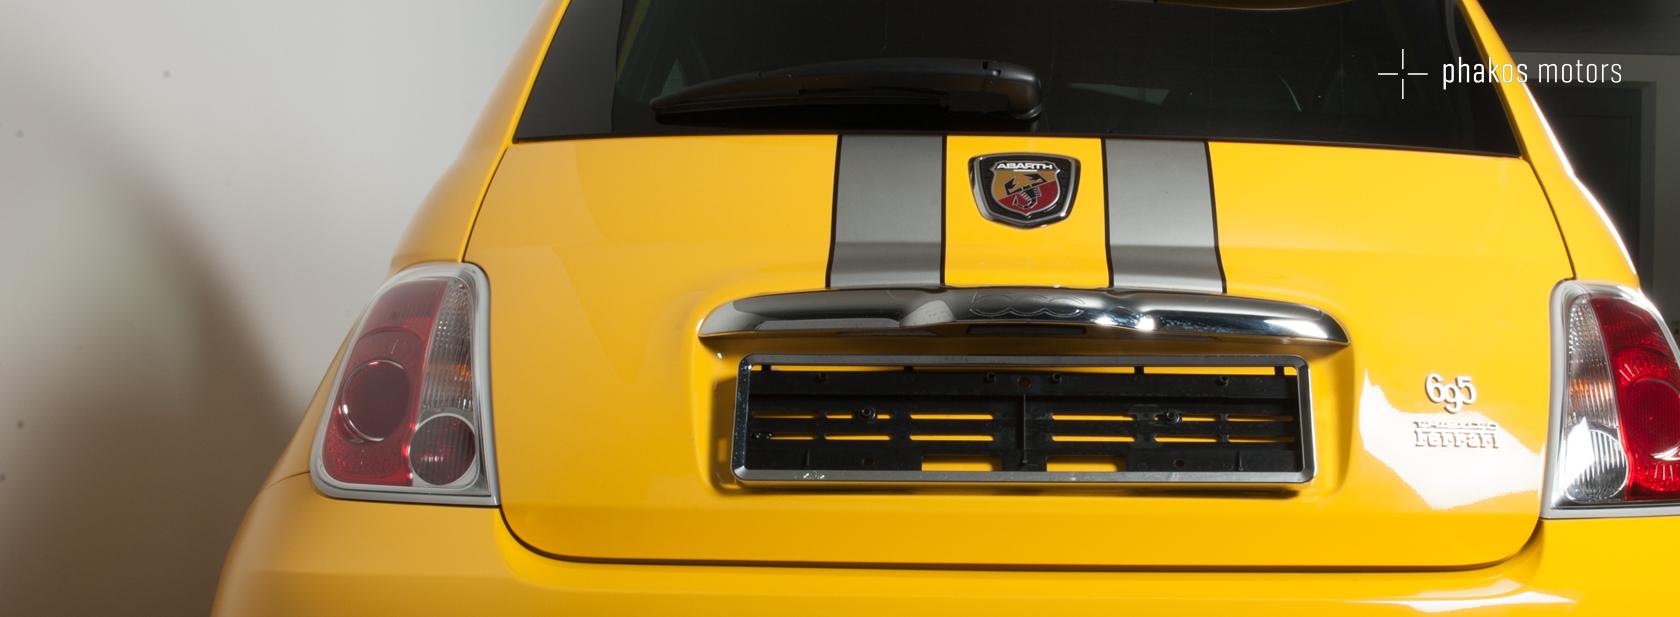 FIAT 500 ABARTH 695 TF